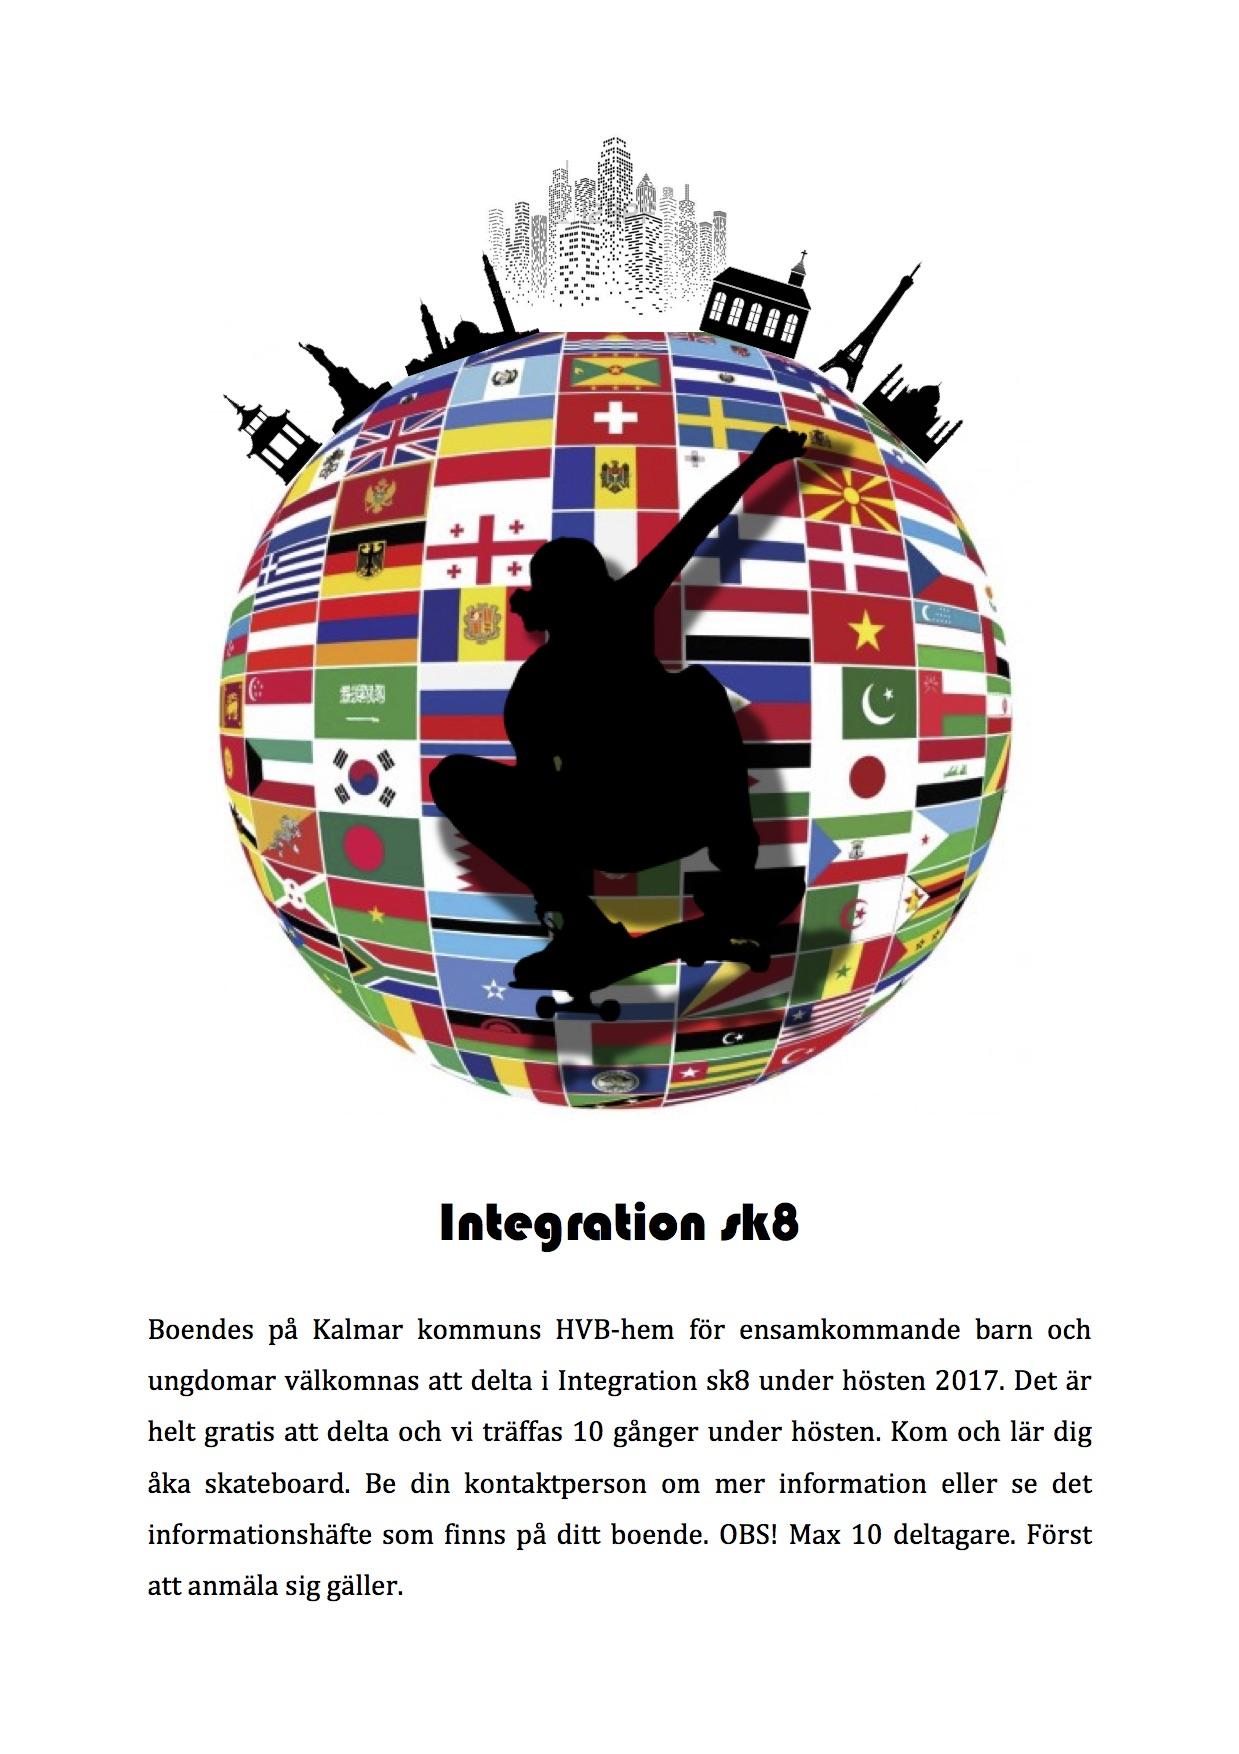 Integration Sk8 - Poster